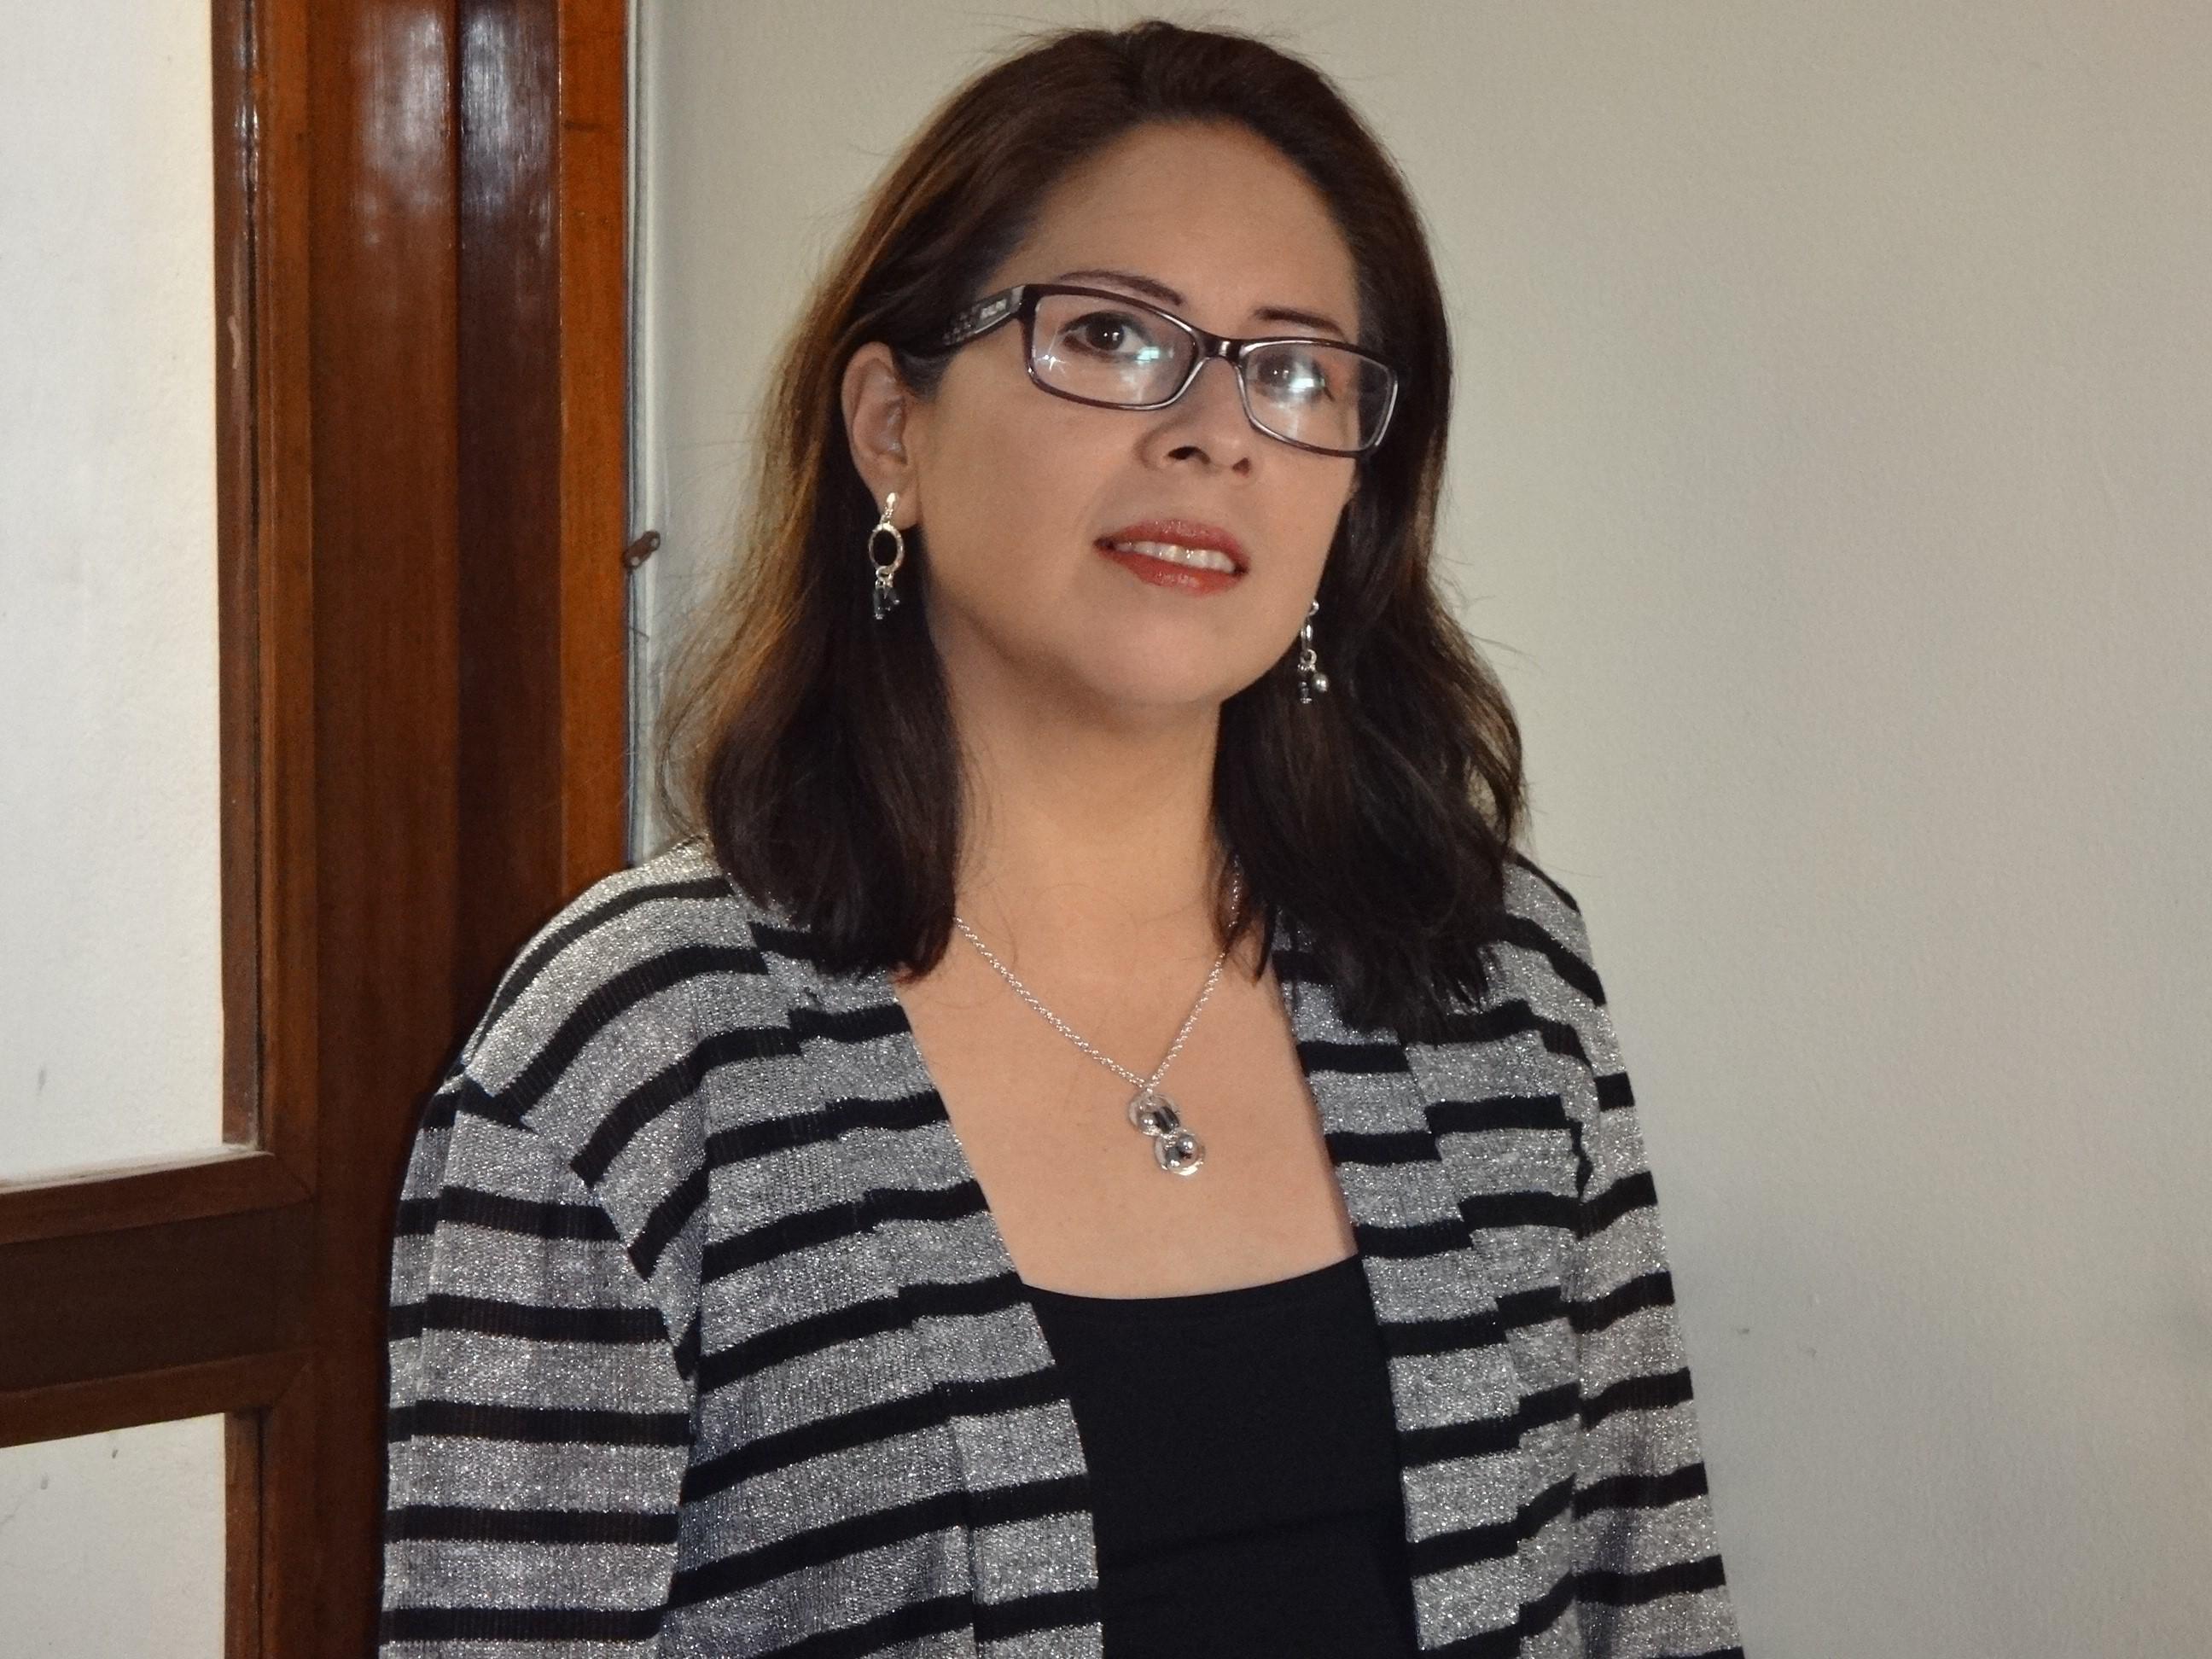 Veronica Sandoval